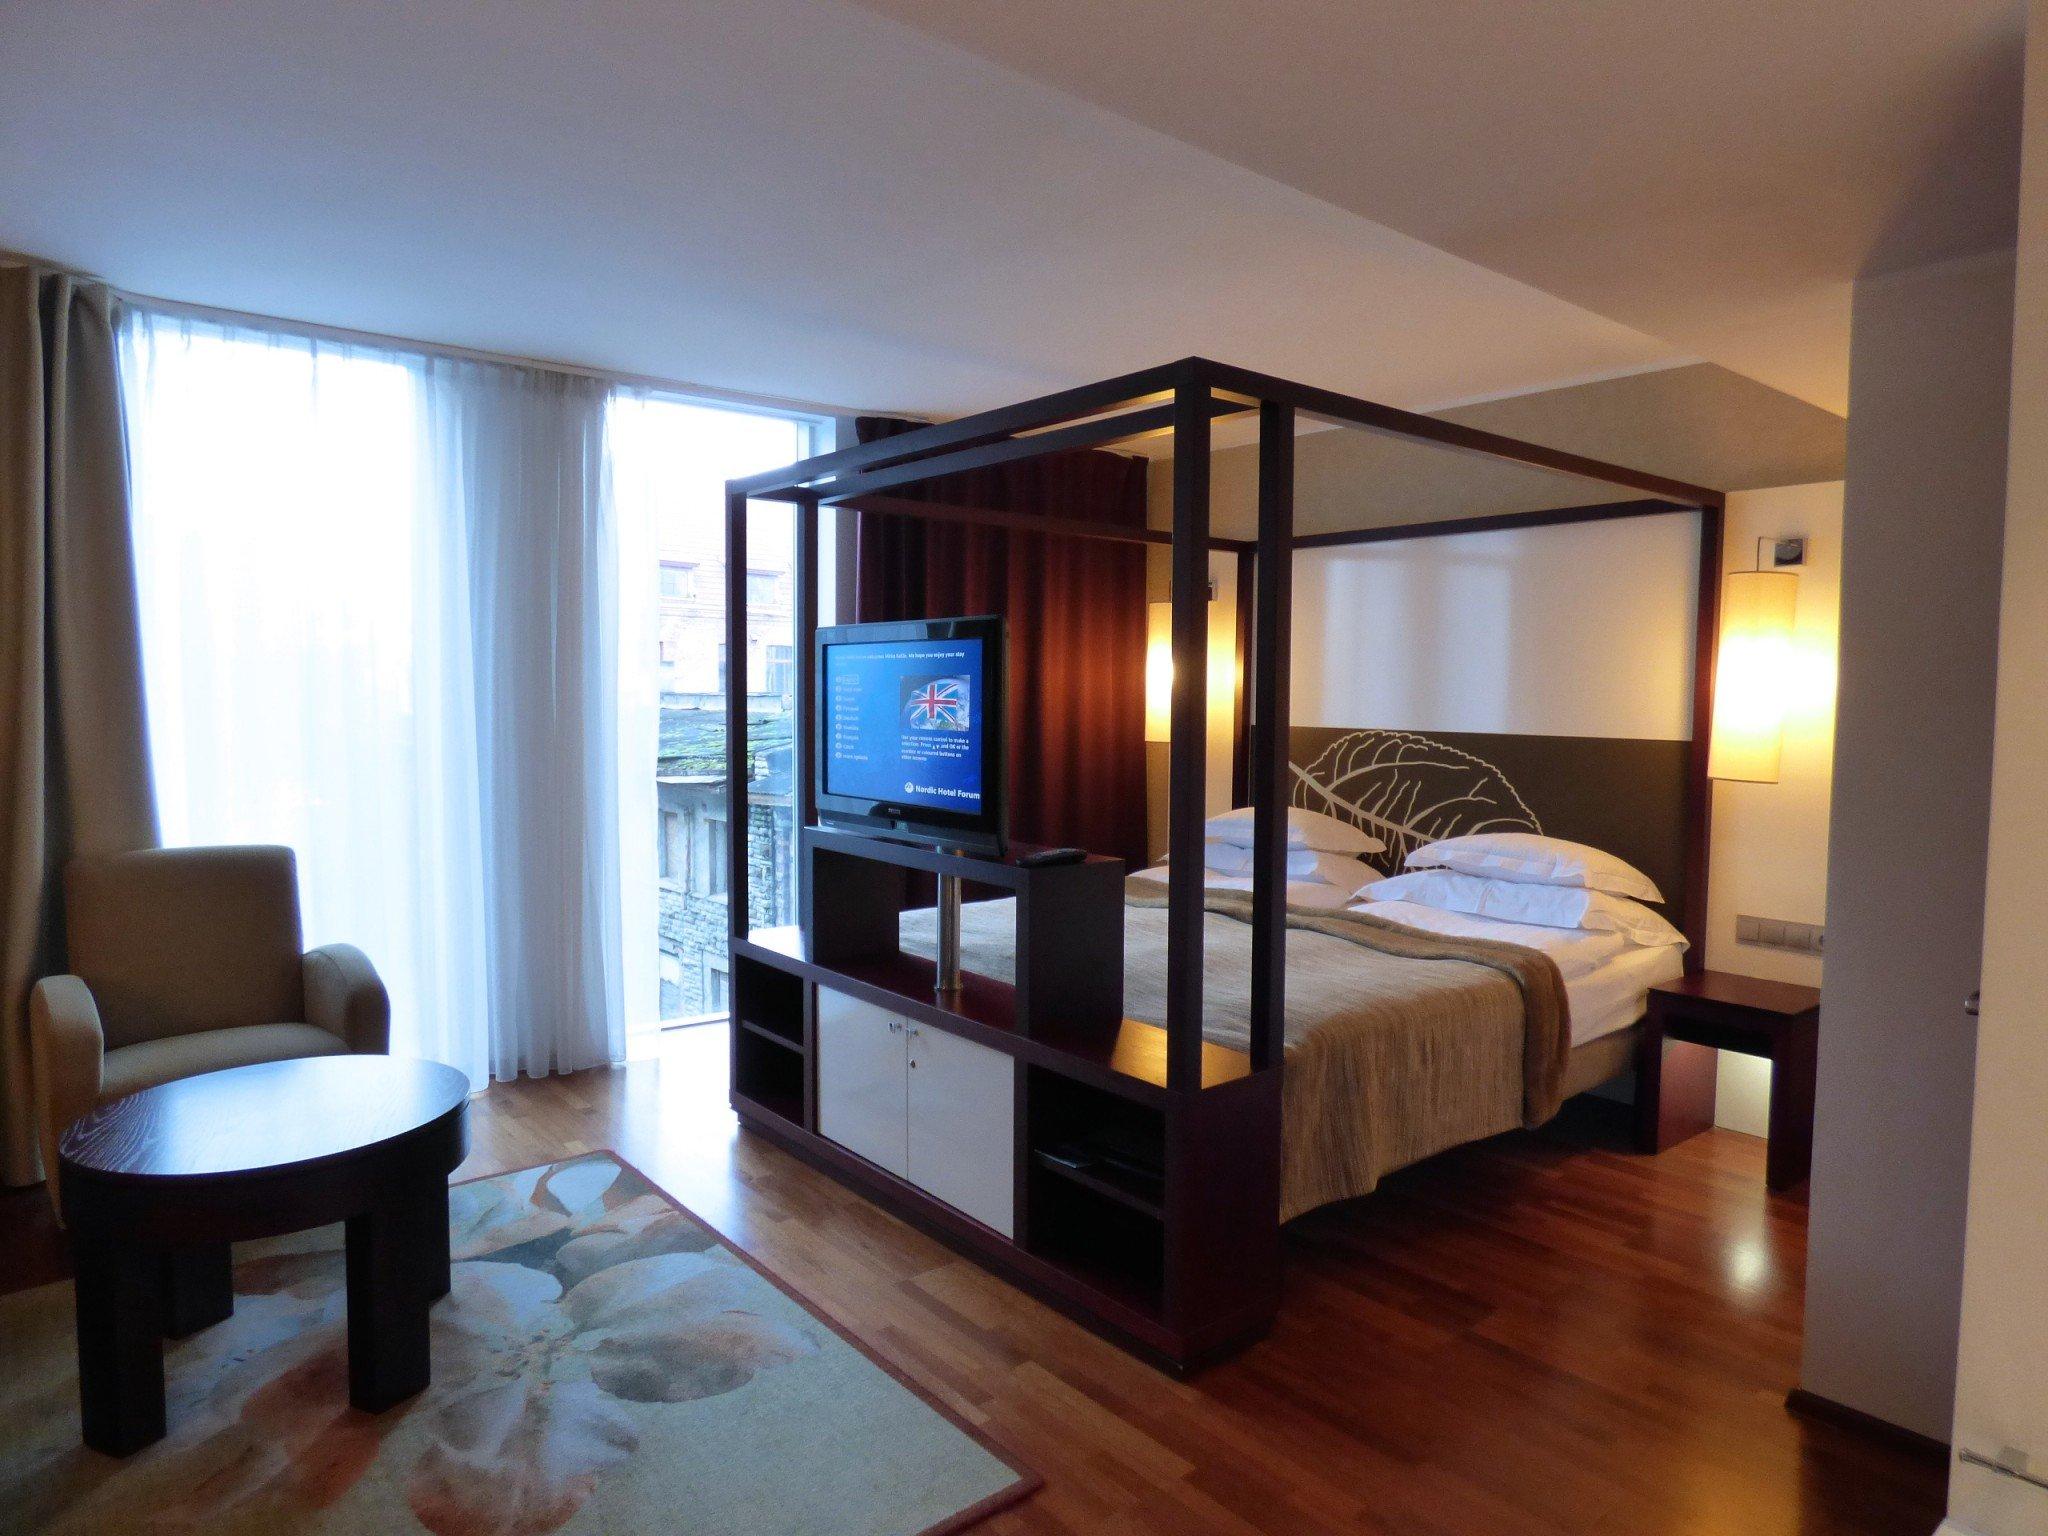 Nordic Hotel Forum Tallinna Delux Room